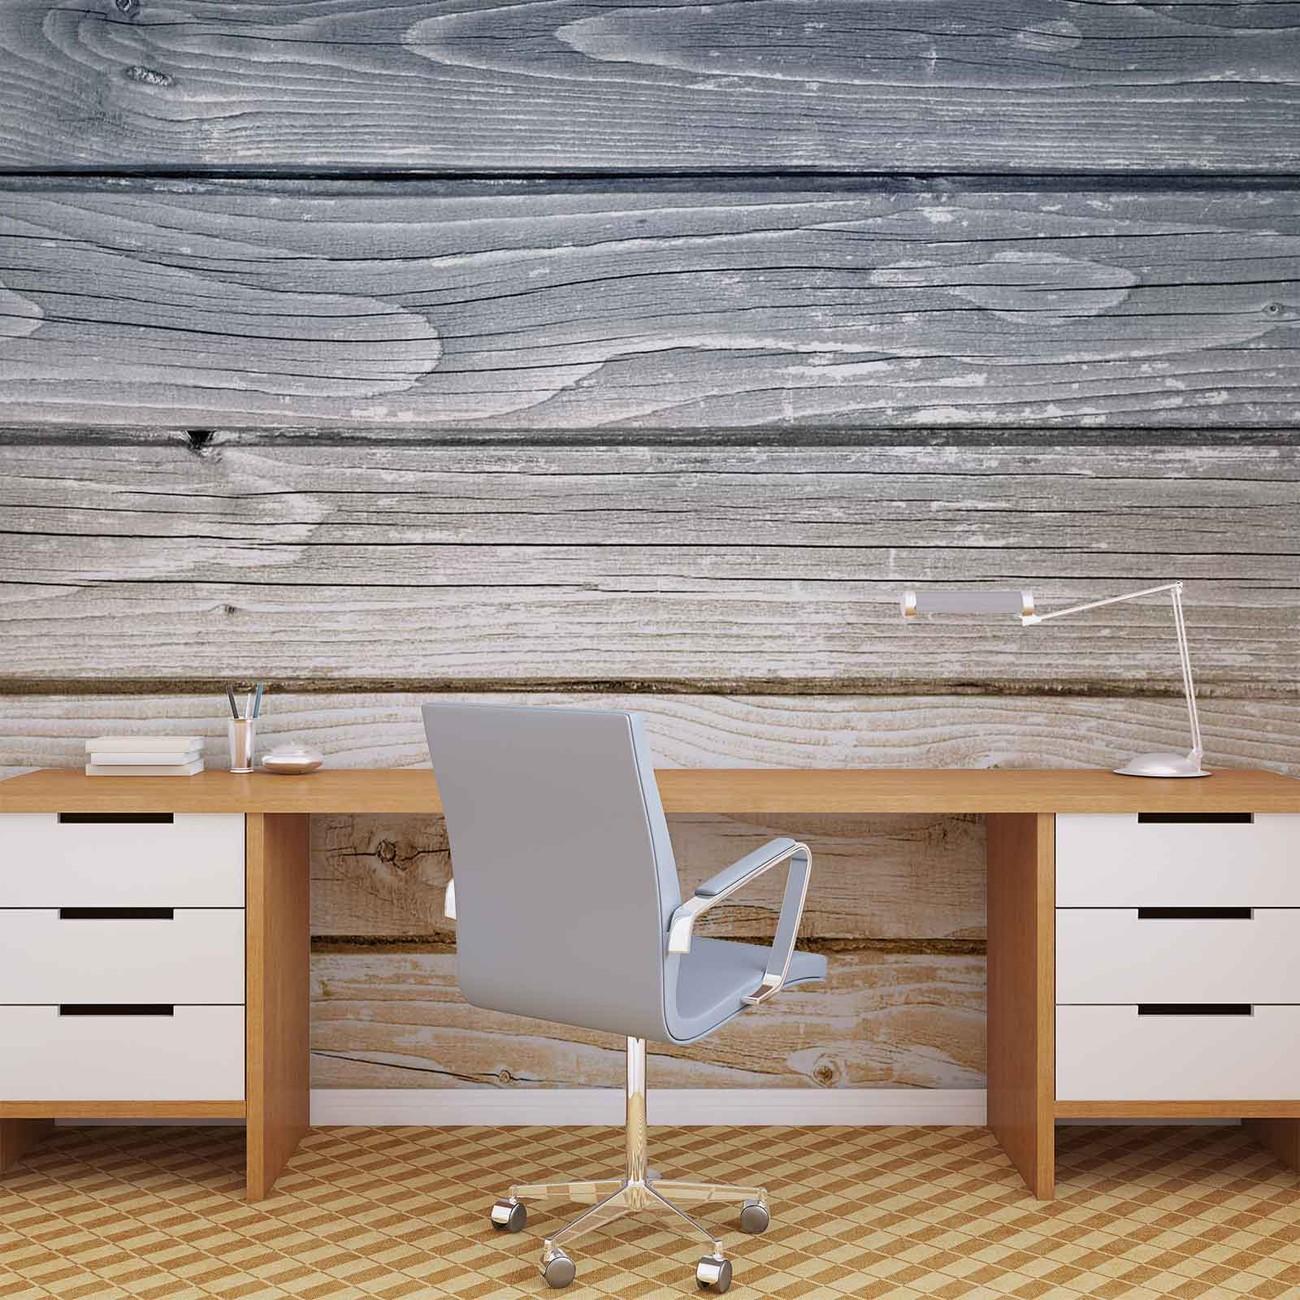 Fotomurale tablones de madera papel pintado - Tablones de madera segunda mano ...